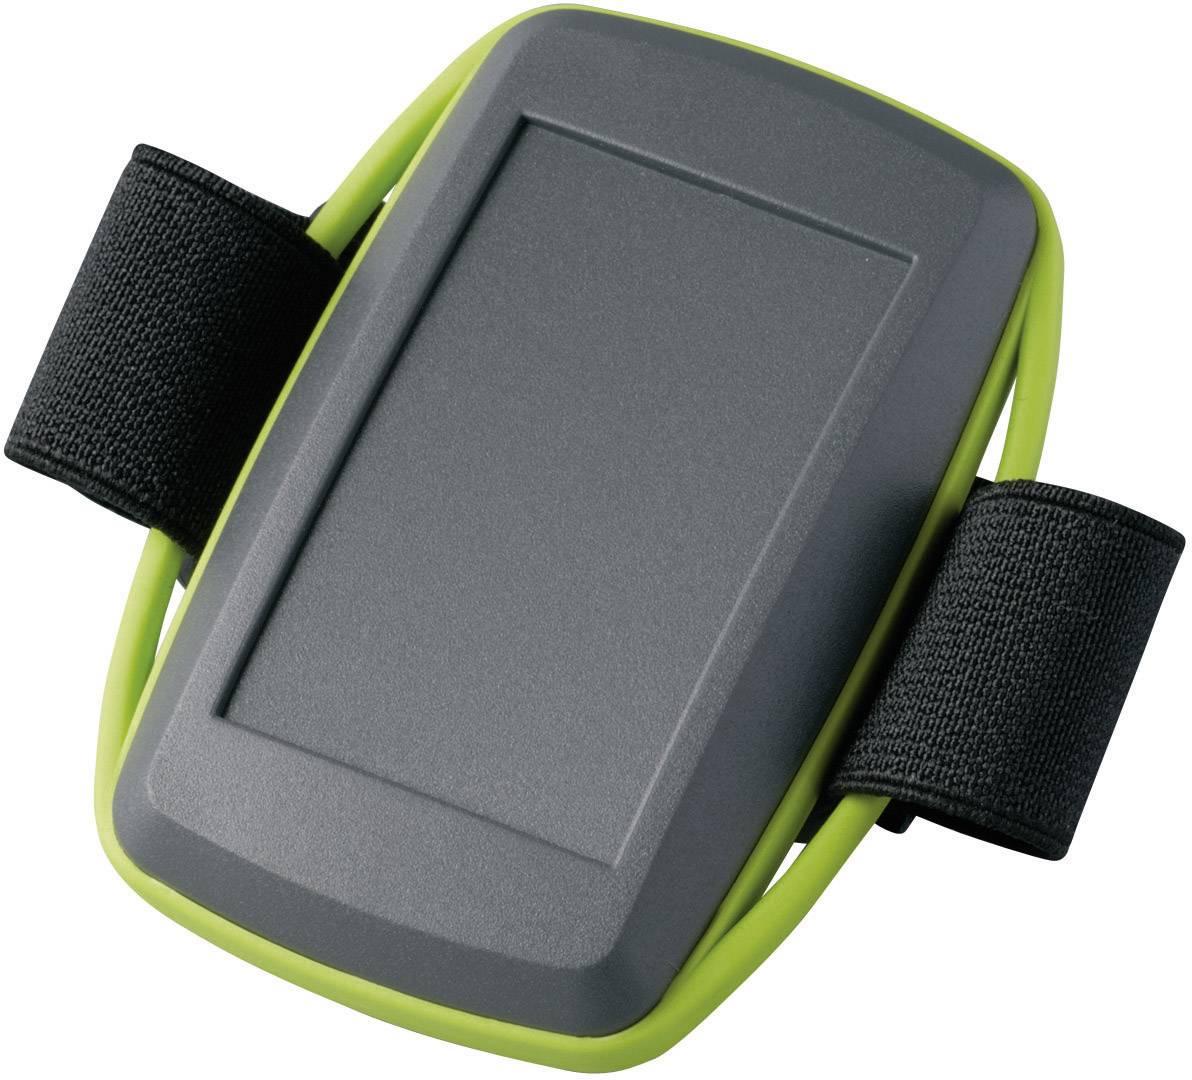 Plastová krabička OKW D9106178, 78 x 48 x 20 mm, umelá hmota, IP40, lávová, zelená, 1 sada